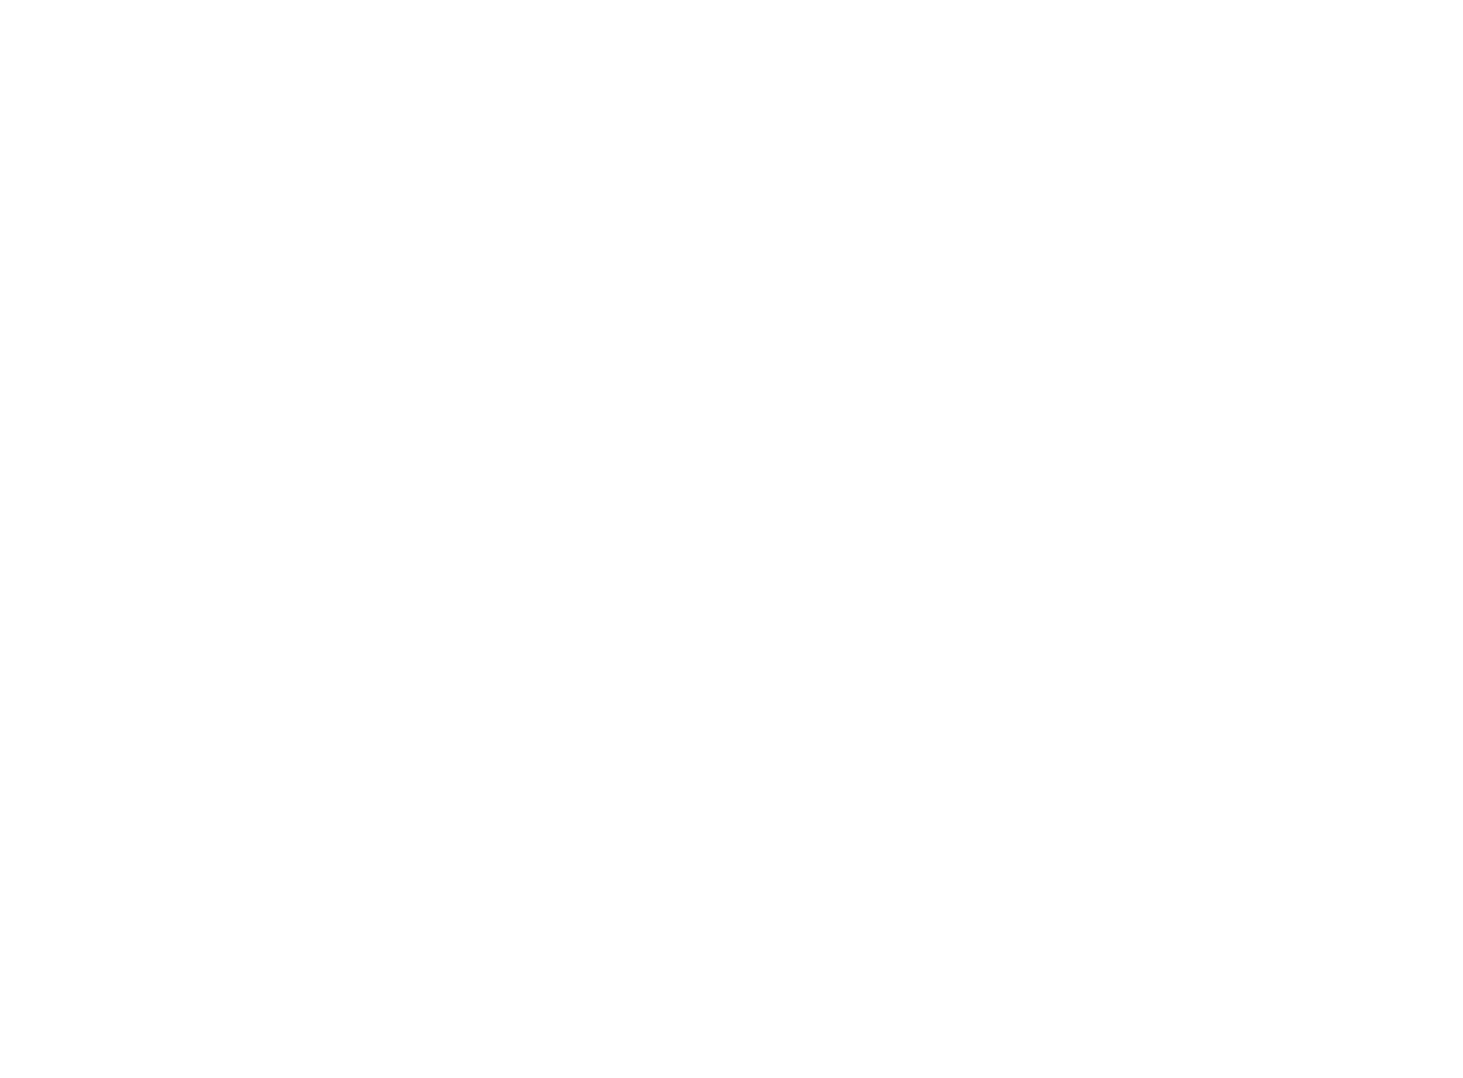 Frauenpavillon St.Gallen, Skizze des Gebäudes